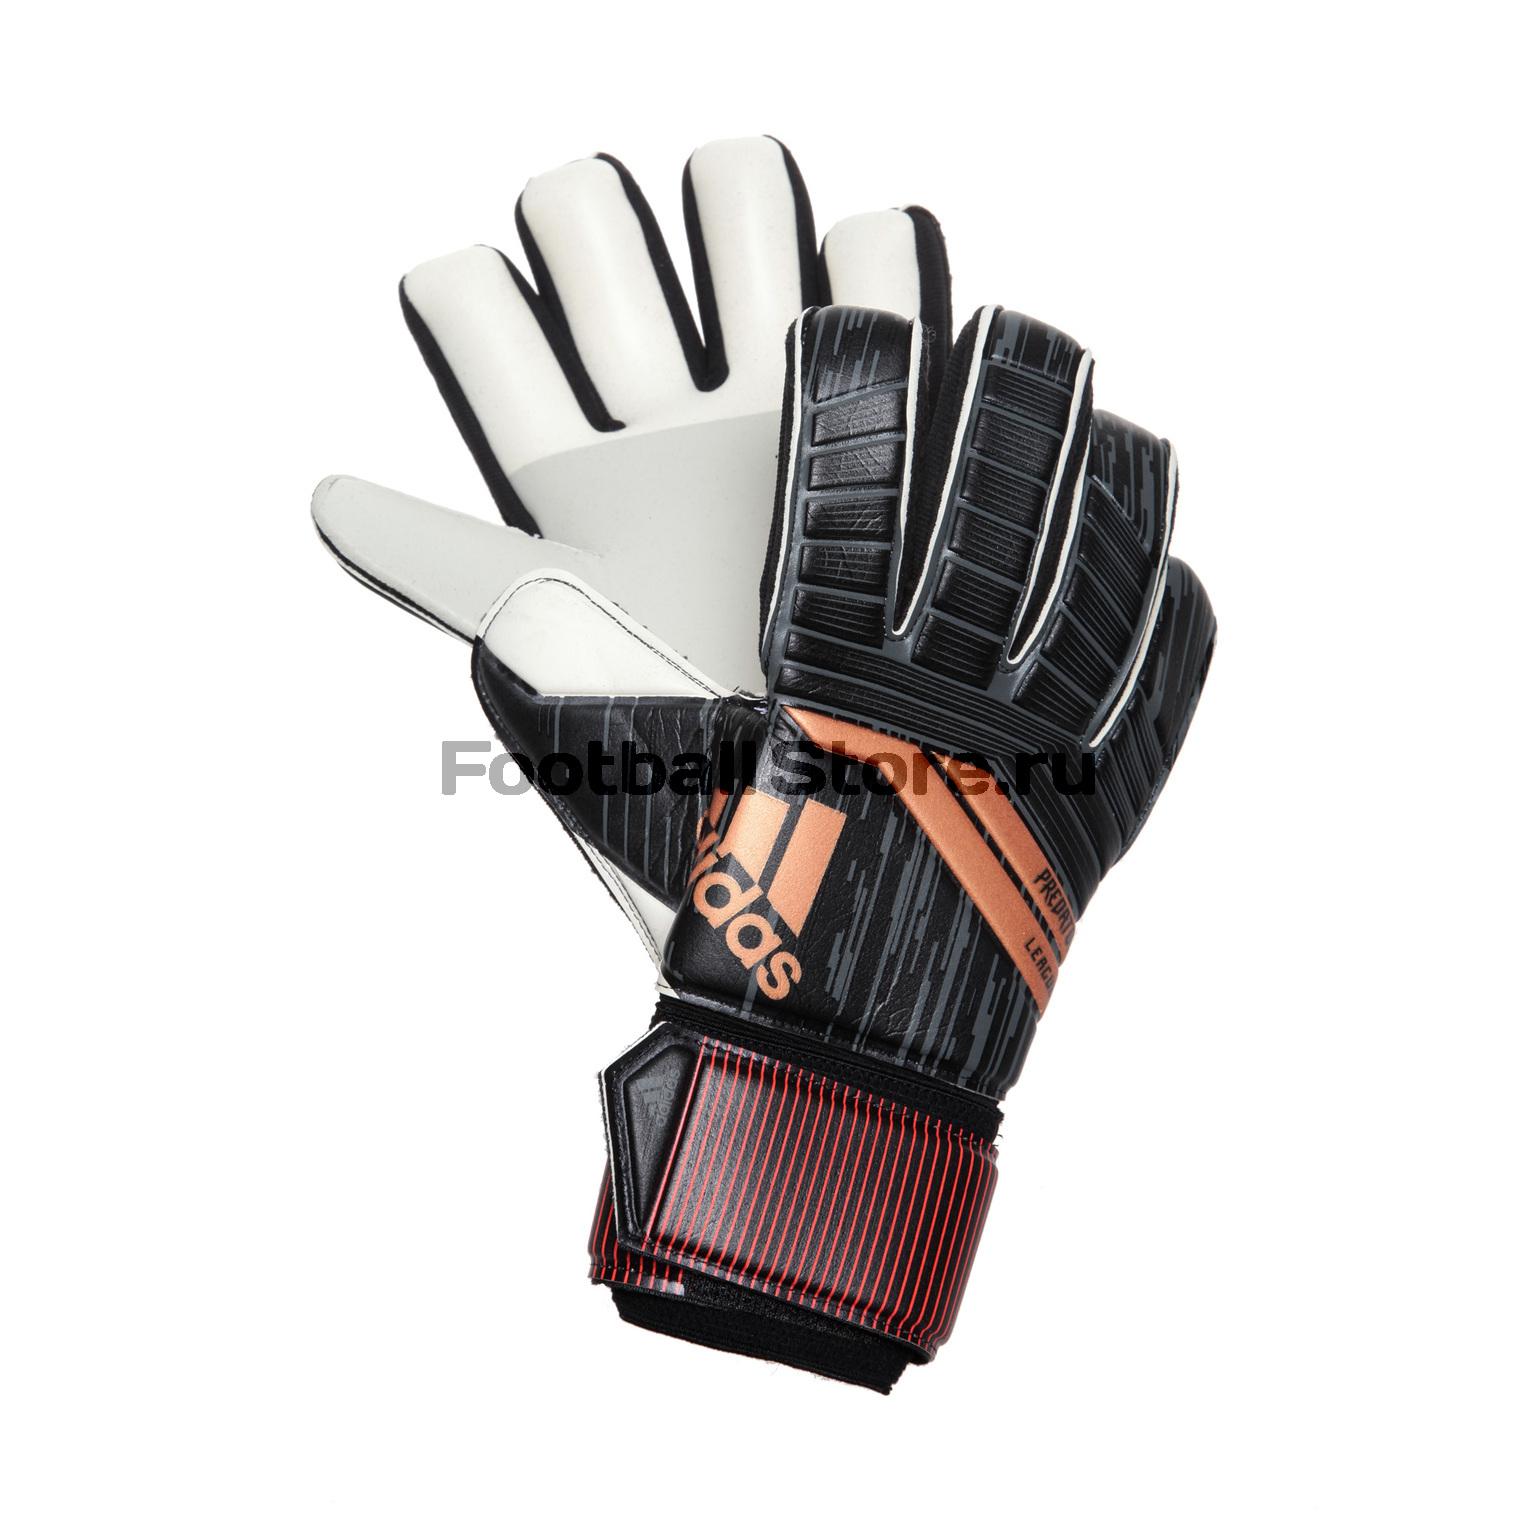 Перчатки вратарские Adidas Predator League CD5255 adidas predator junior gk glove